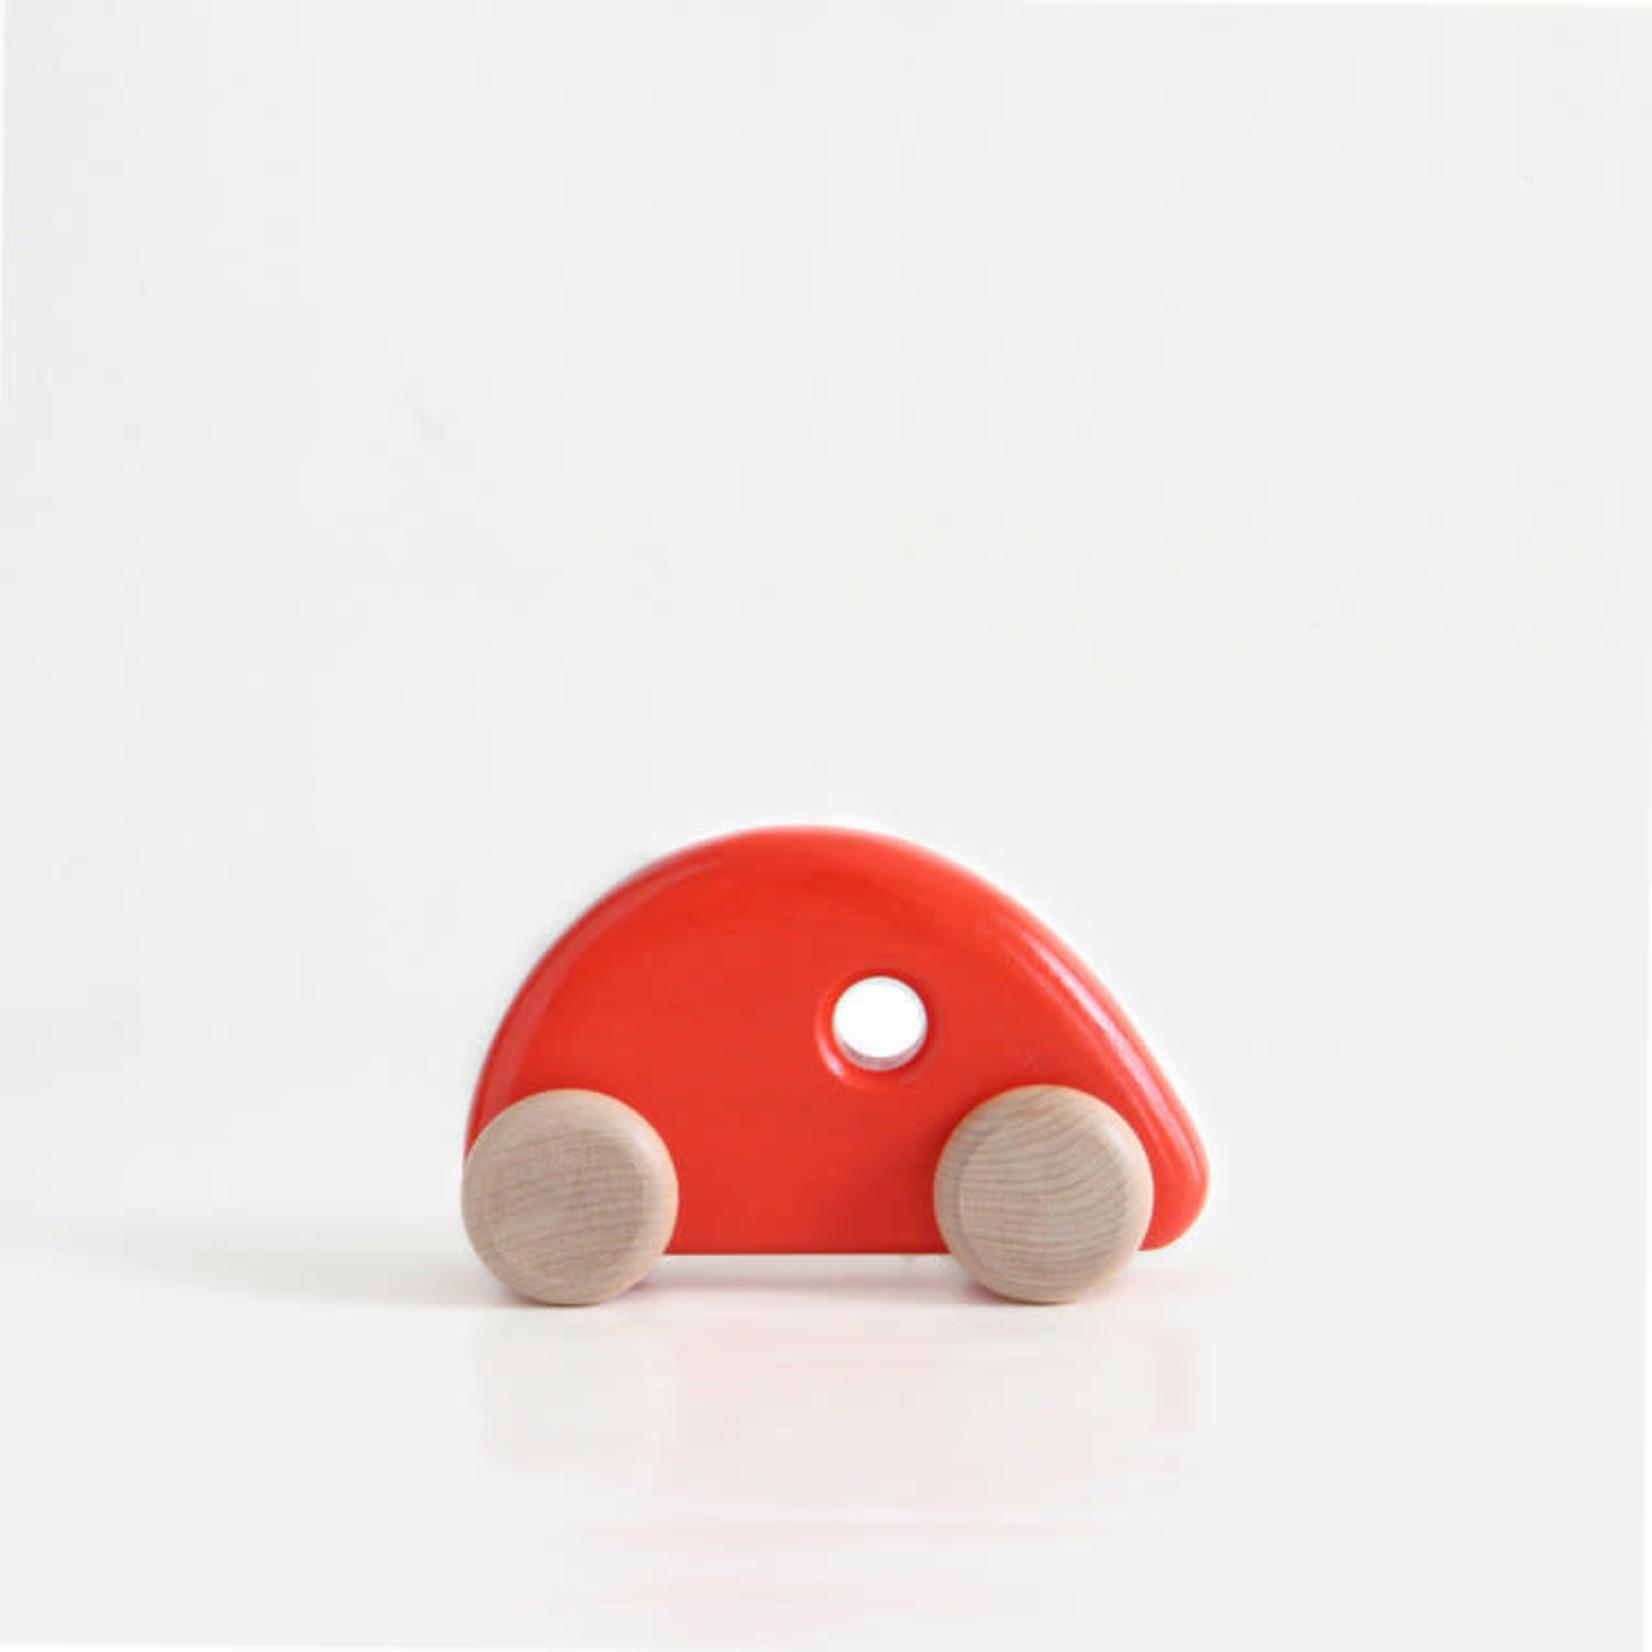 Caribou Caribou Petite voiture / rouge